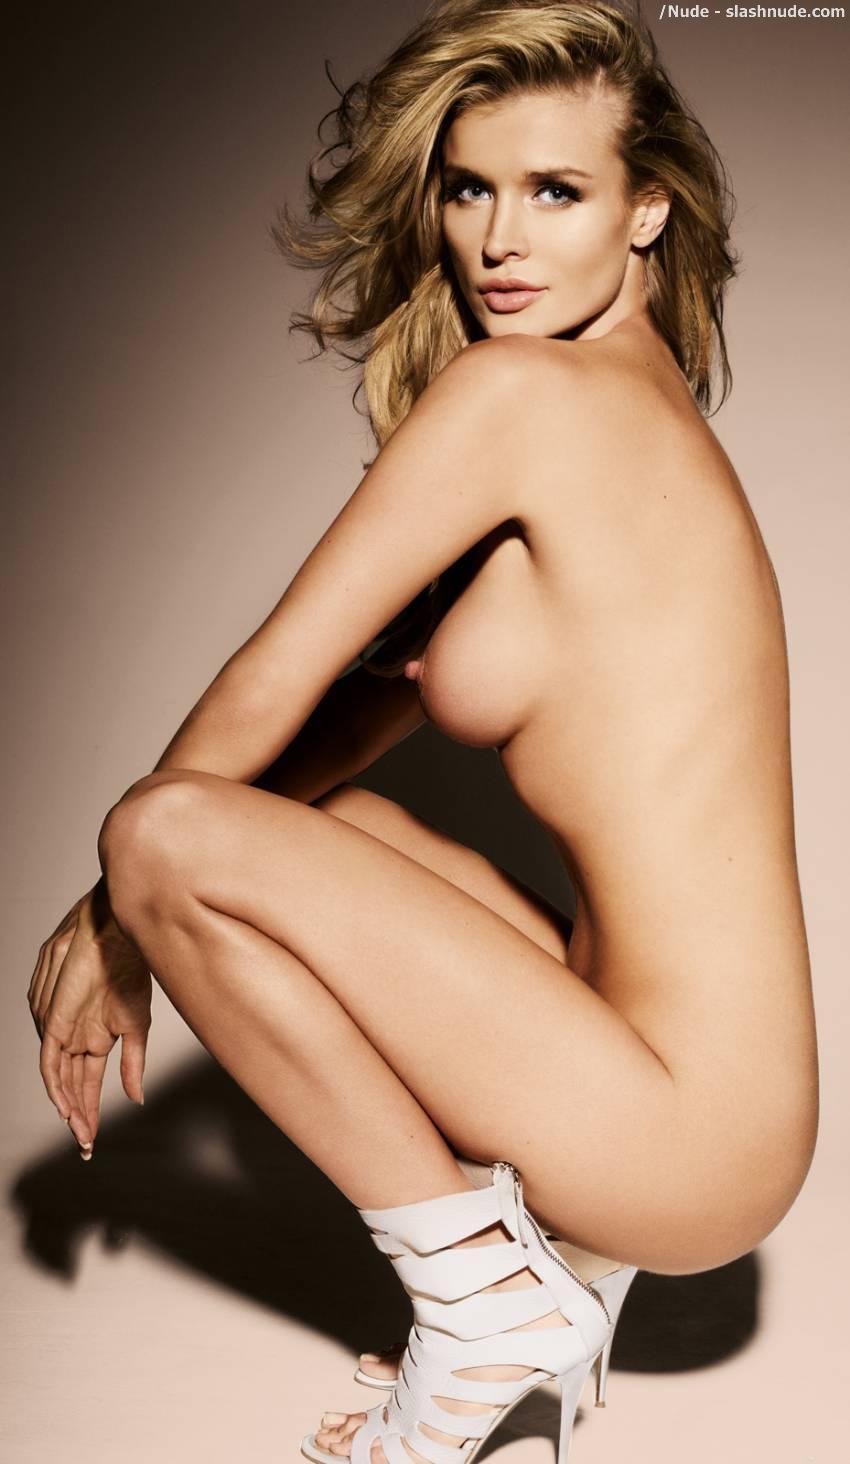 Gallery joanna krupa nude